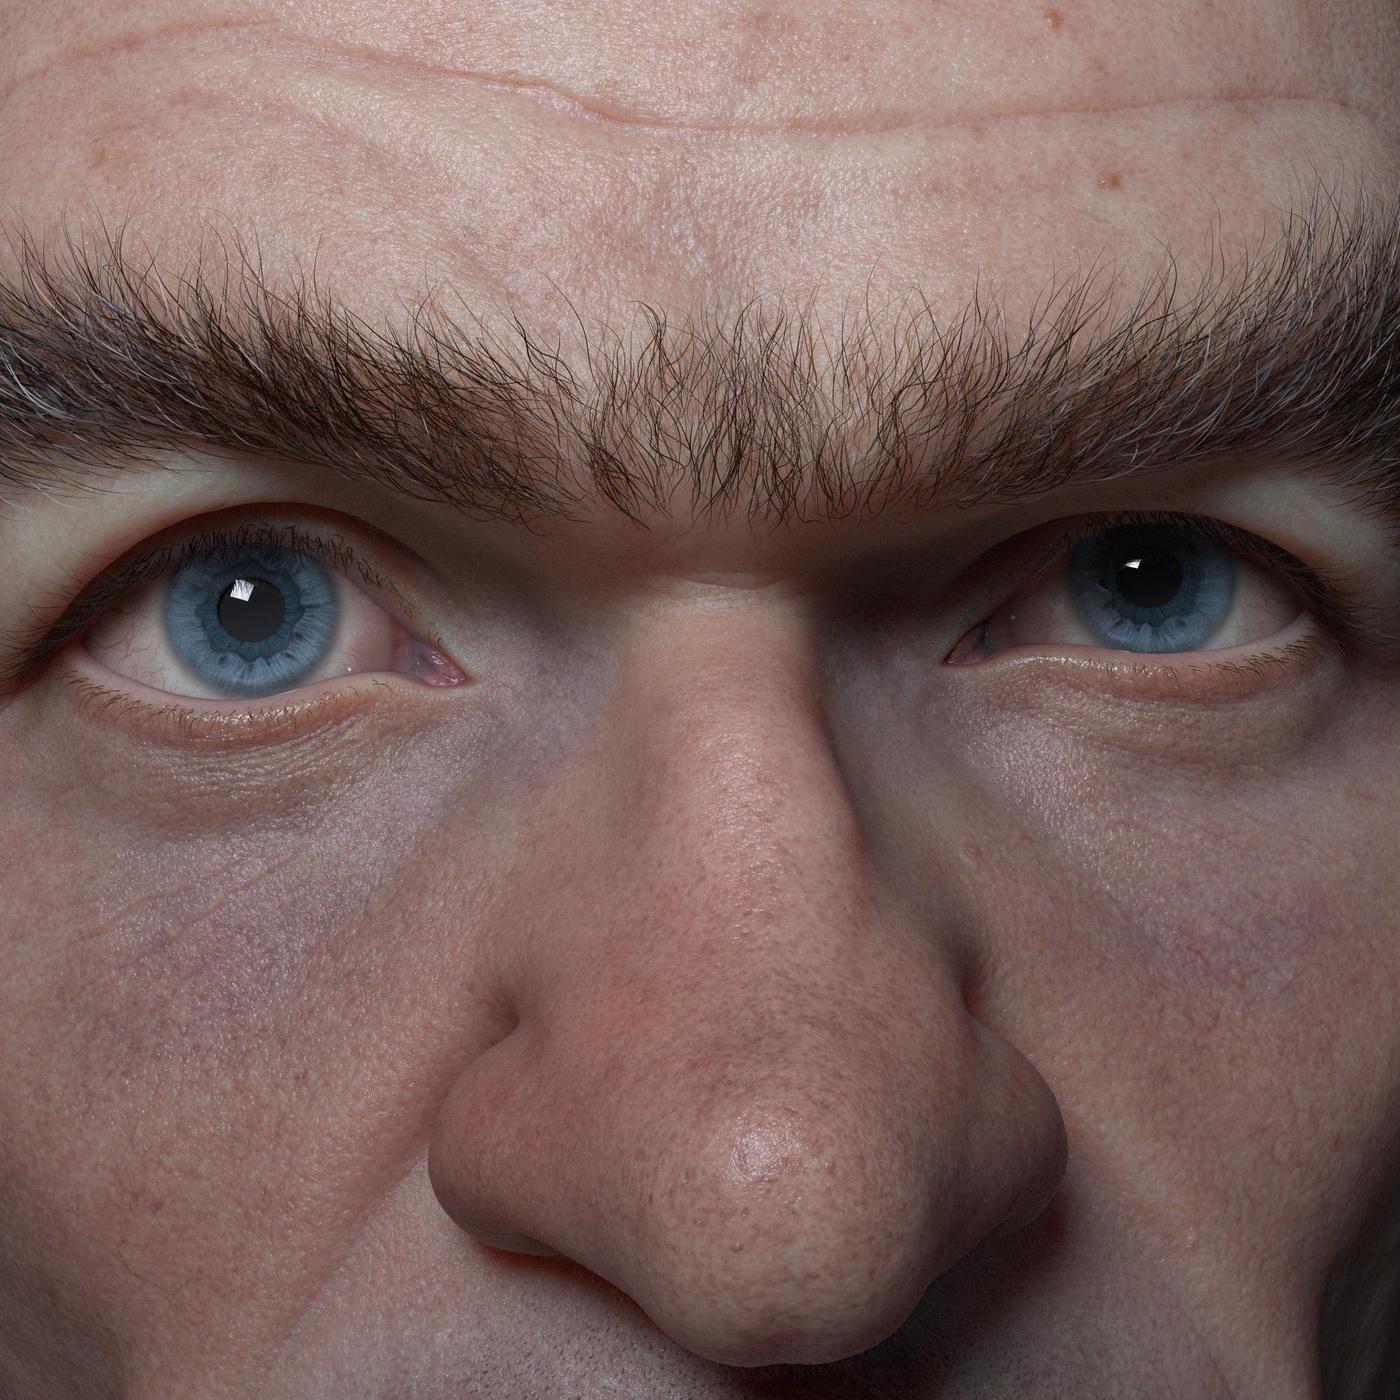 compositing render 3d profile close up detailing shape